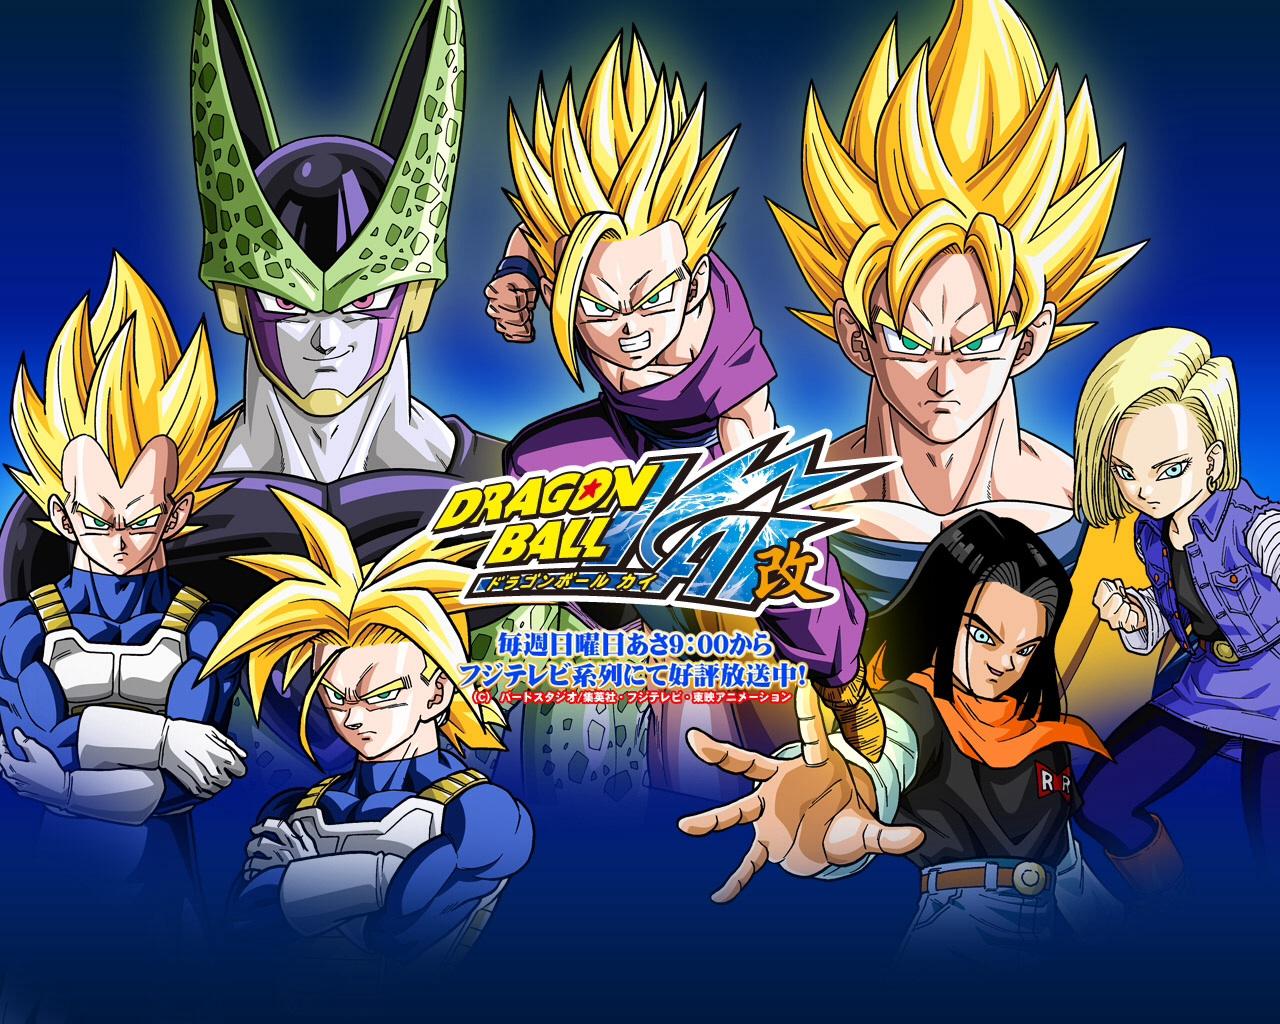 Cartoon Network Dragon Ball Z Kai Coming To Toonami This